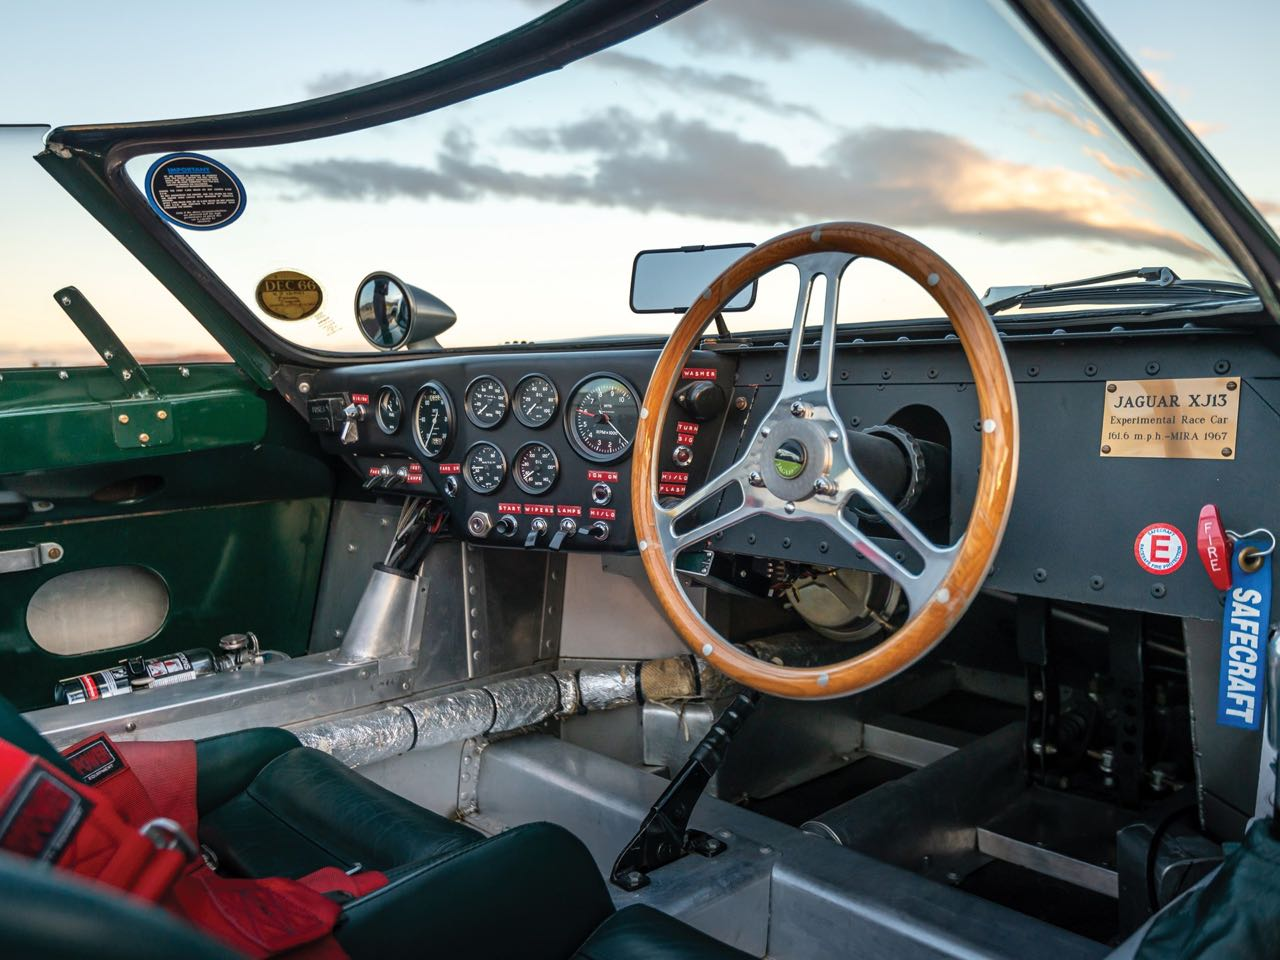 Jaguar XJ13... Unlucky Number ! 16